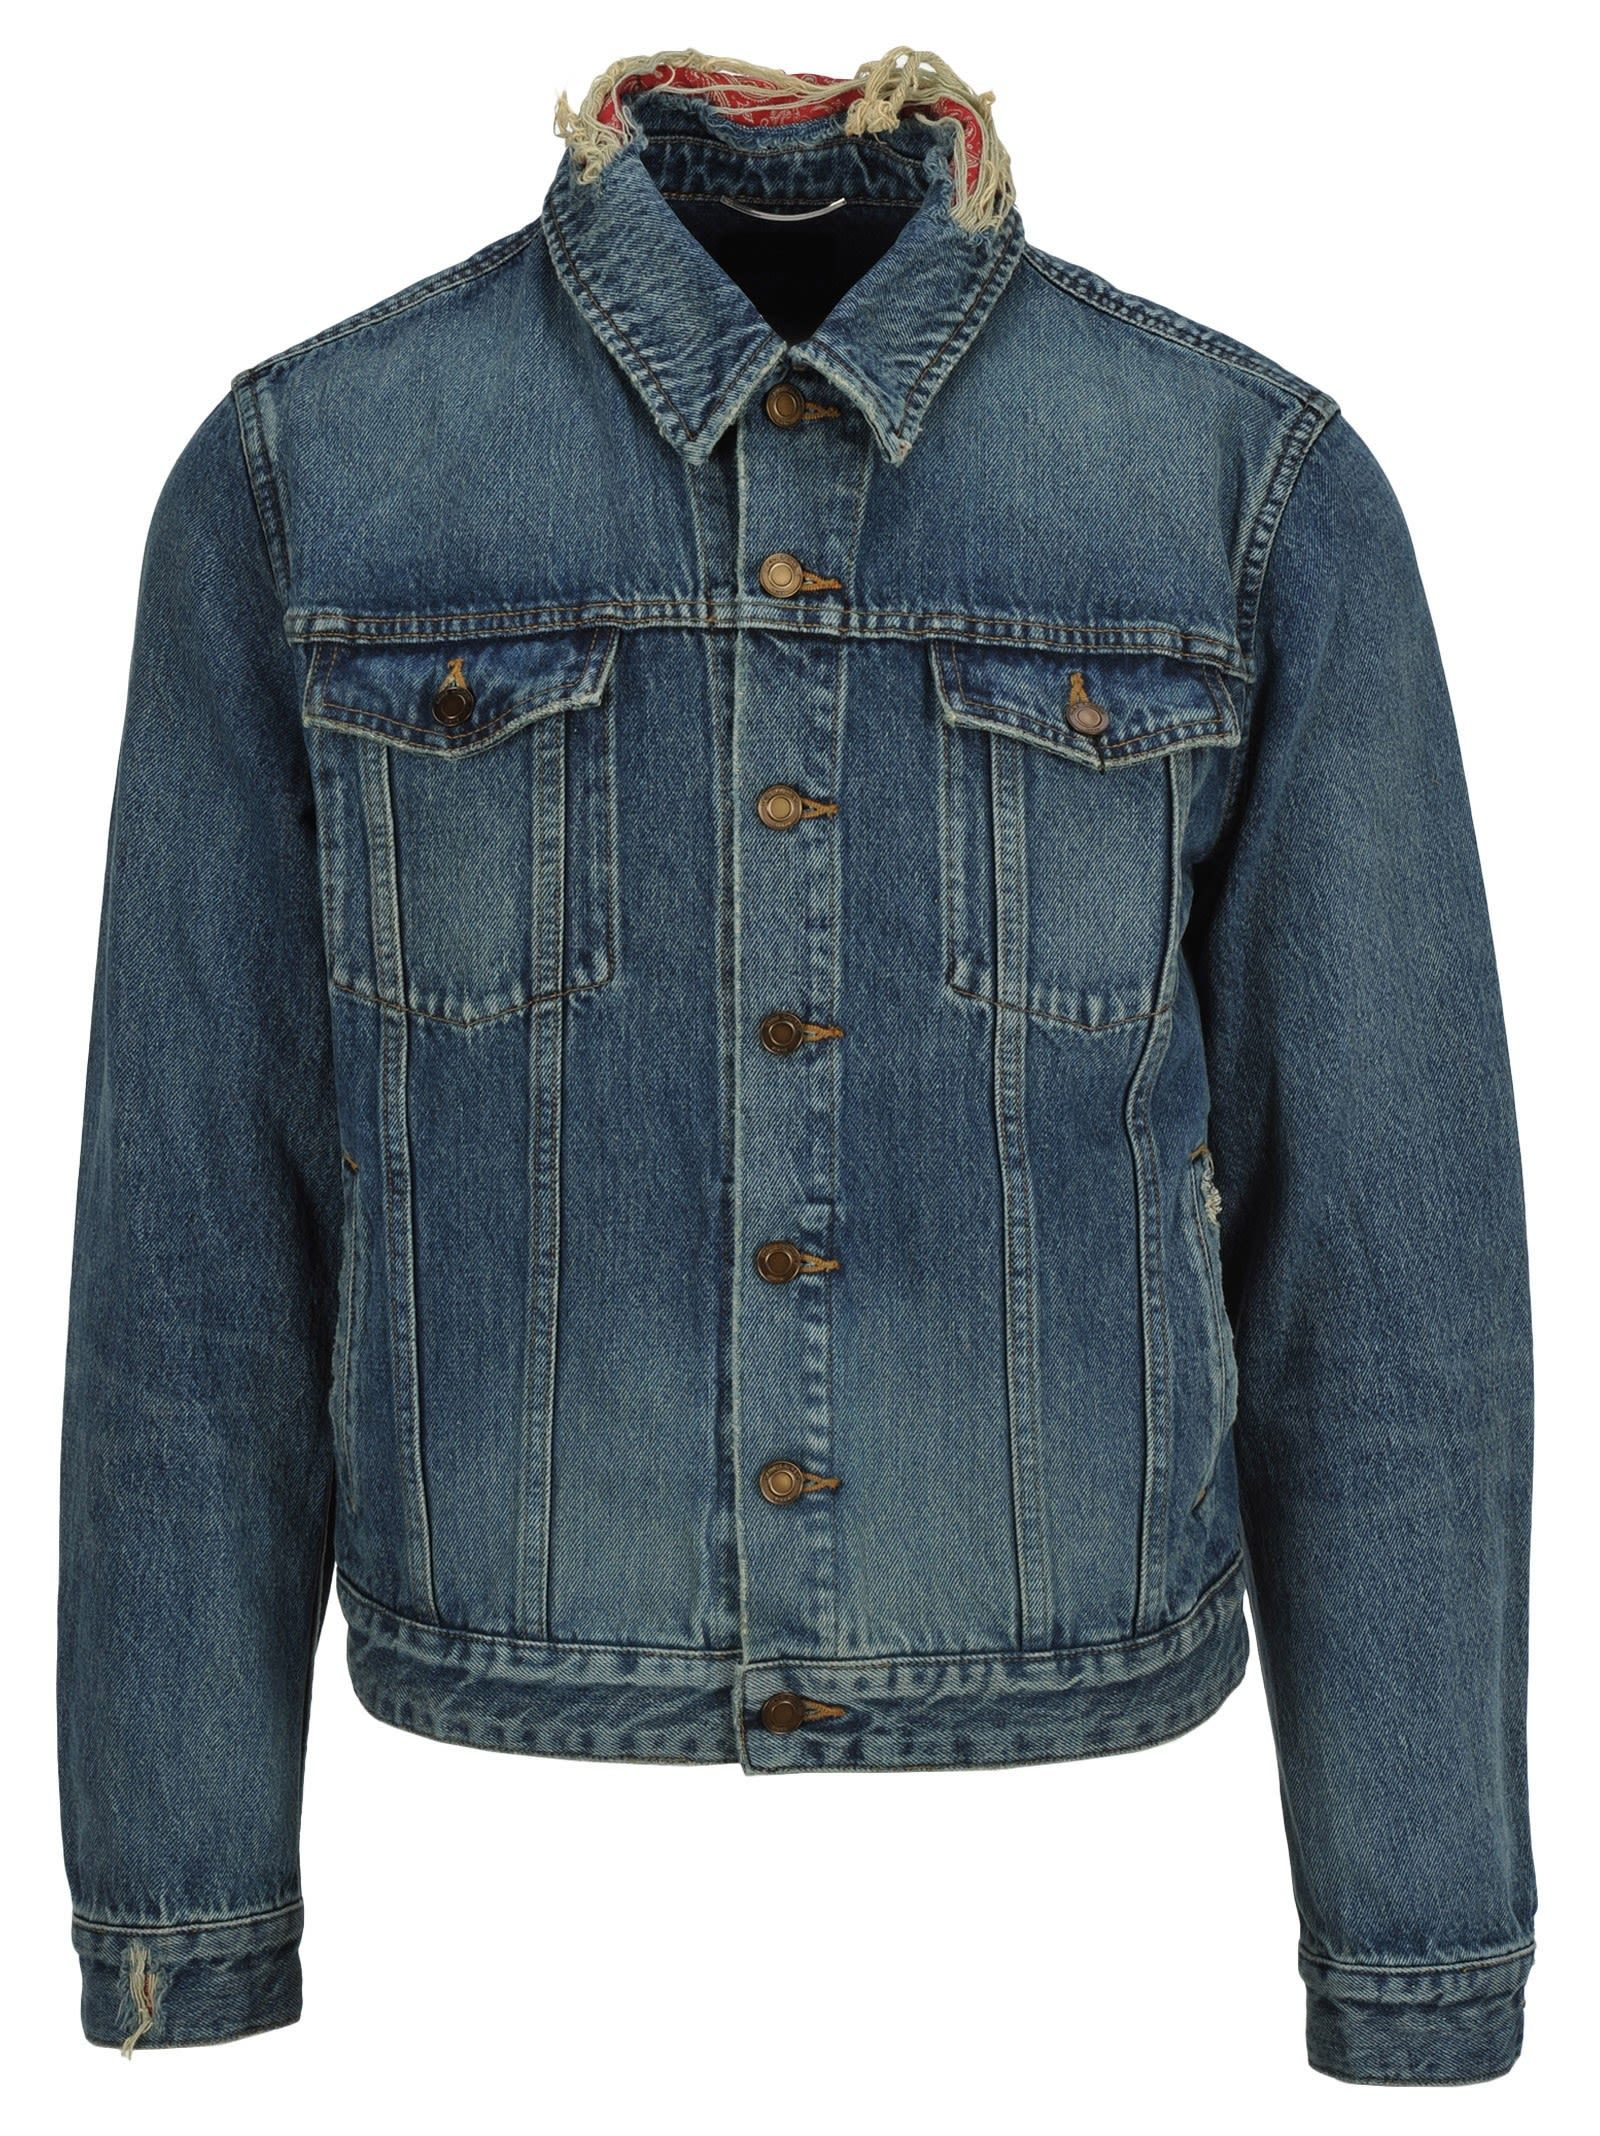 Saint Laurent Denim Jacket Bandana Saintlaurent Cloth Denim Details Denim Jacket Distressed Denim Jacket [ 2136 x 1600 Pixel ]